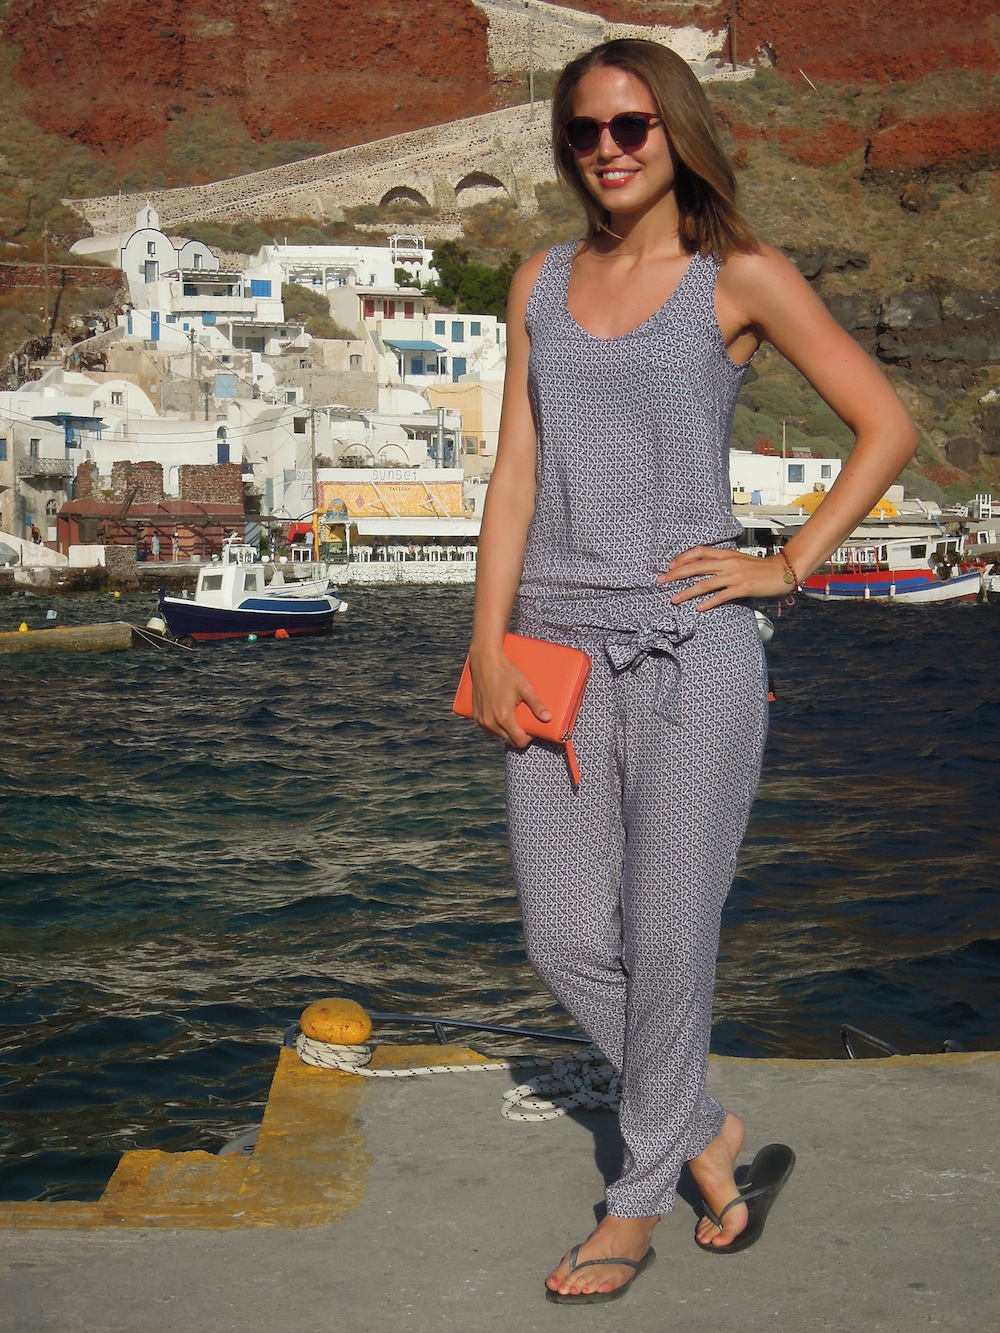 outfit-mcgregor-suelovesnyc-overall-greece-santorin1